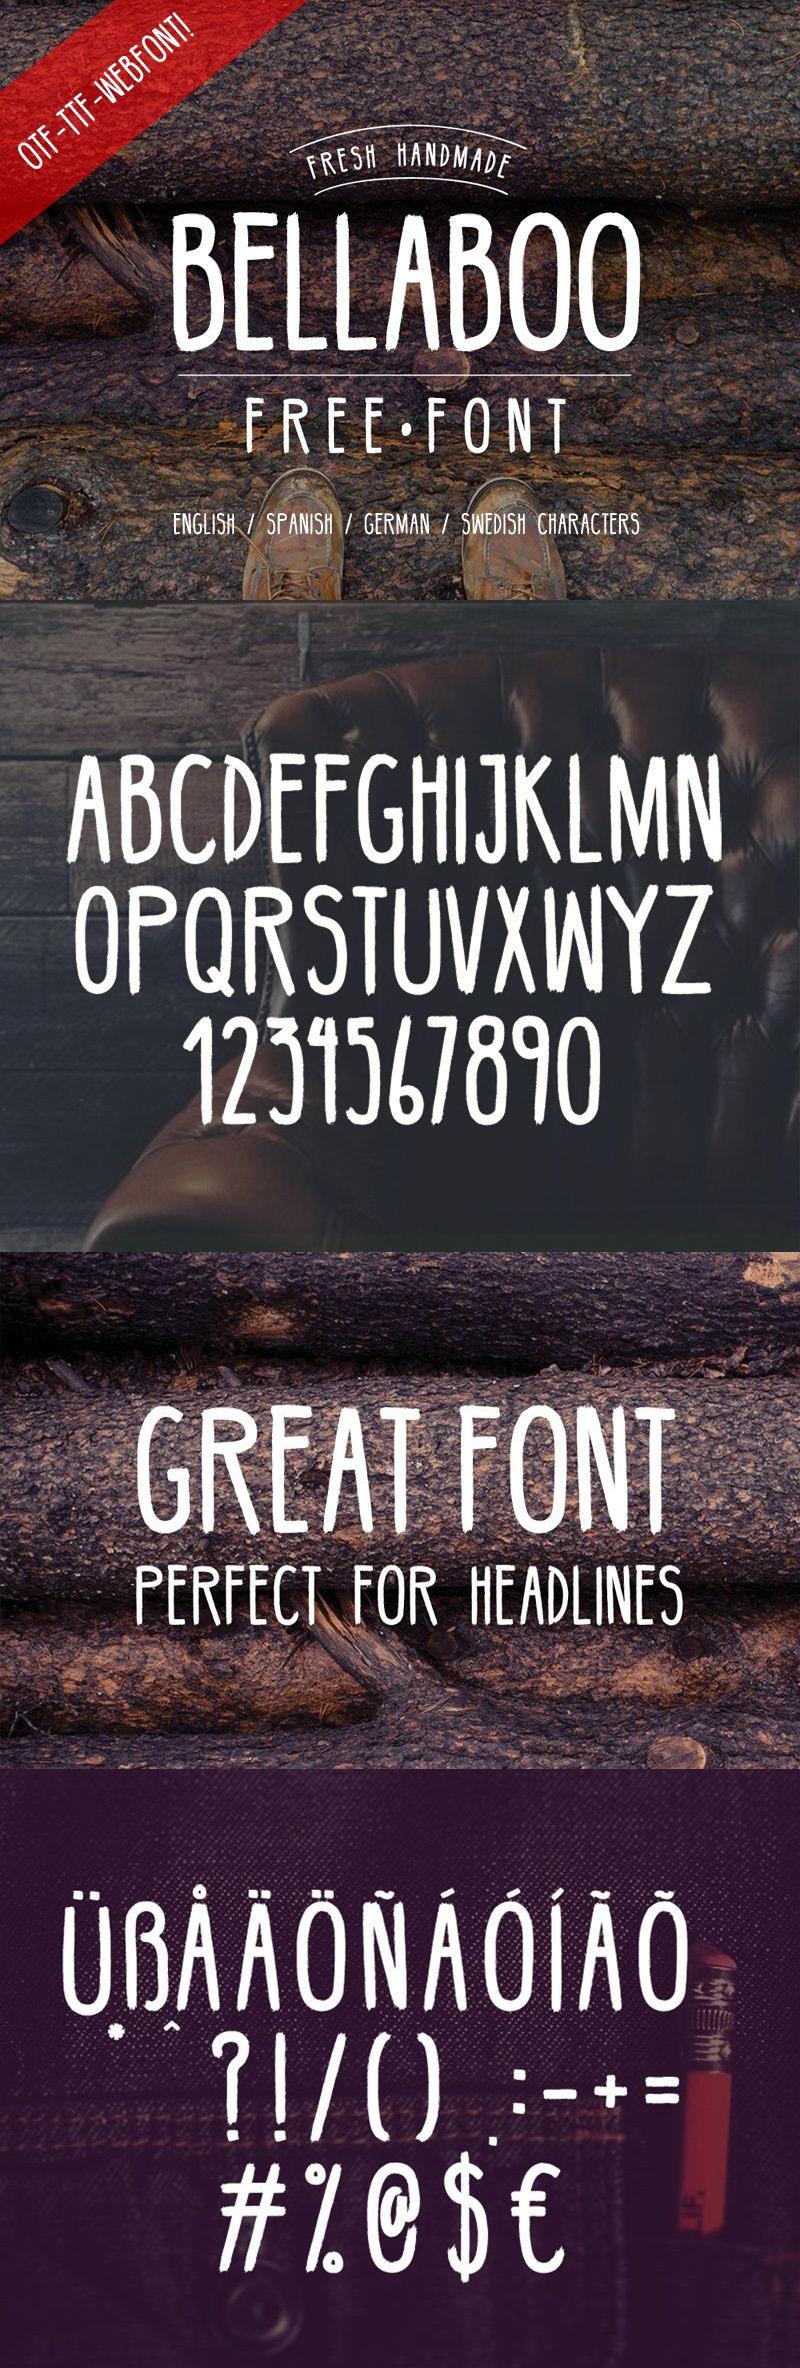 bellabo typeface